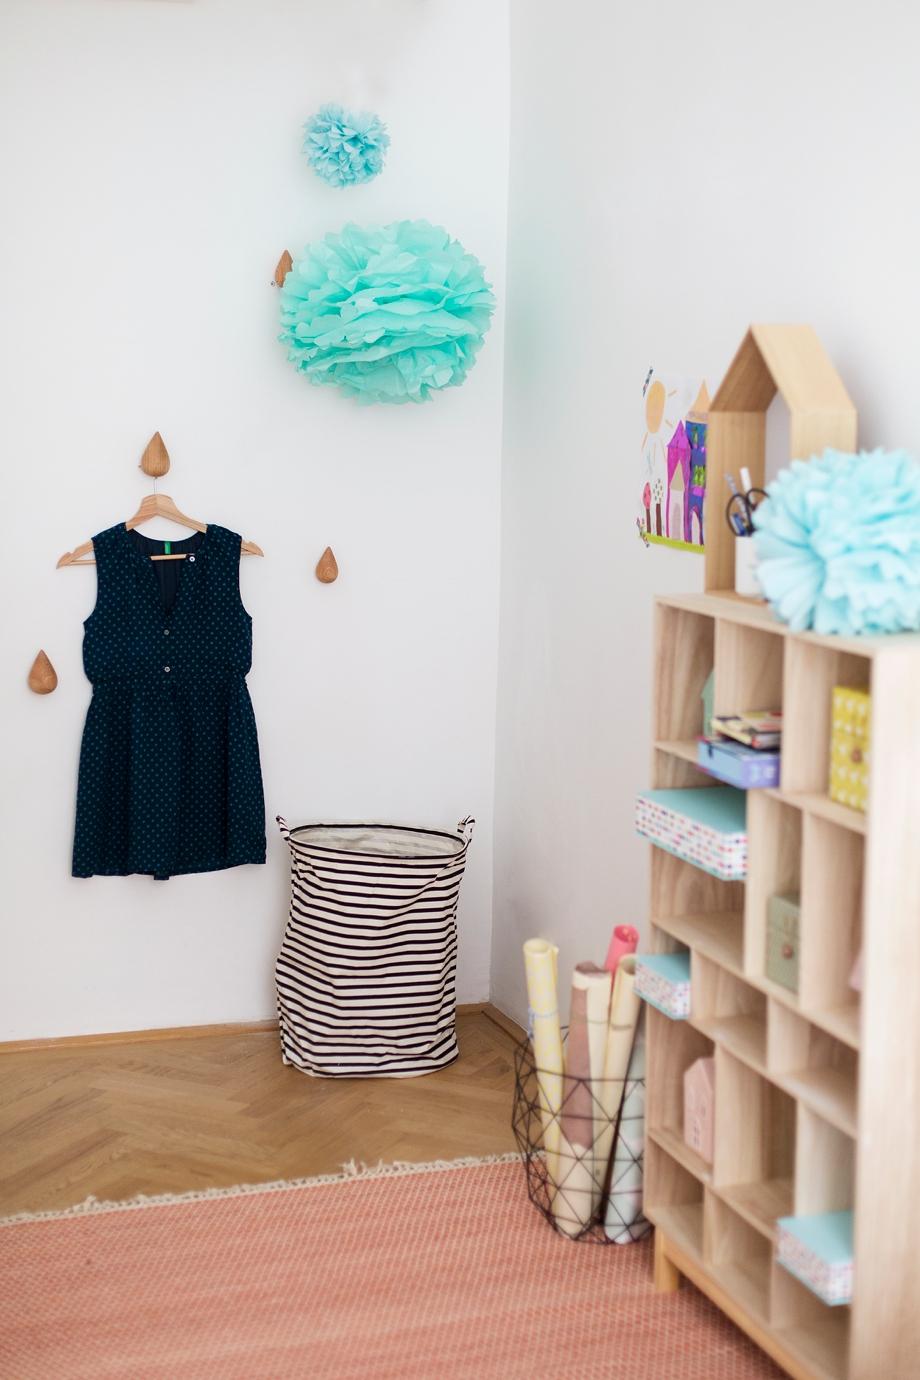 Depot kinderzimmer dekoideen einrichtungstipps for Einrichtungstipps kinderzimmer